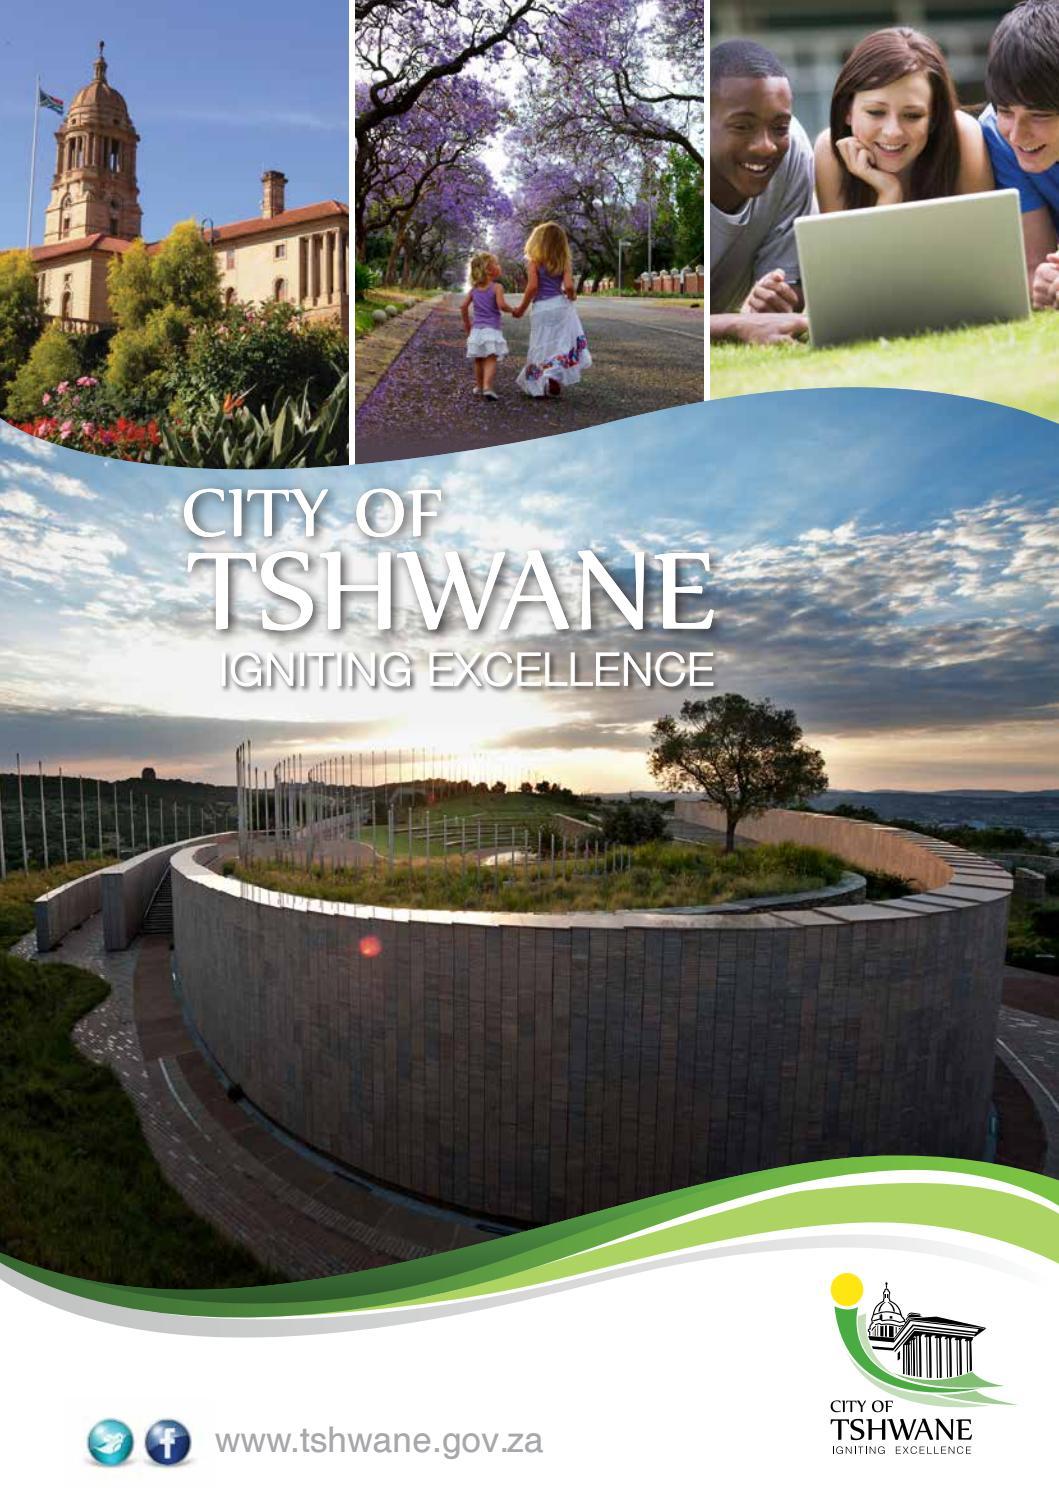 City of Tshwane 2022 by 3S Media Issuu